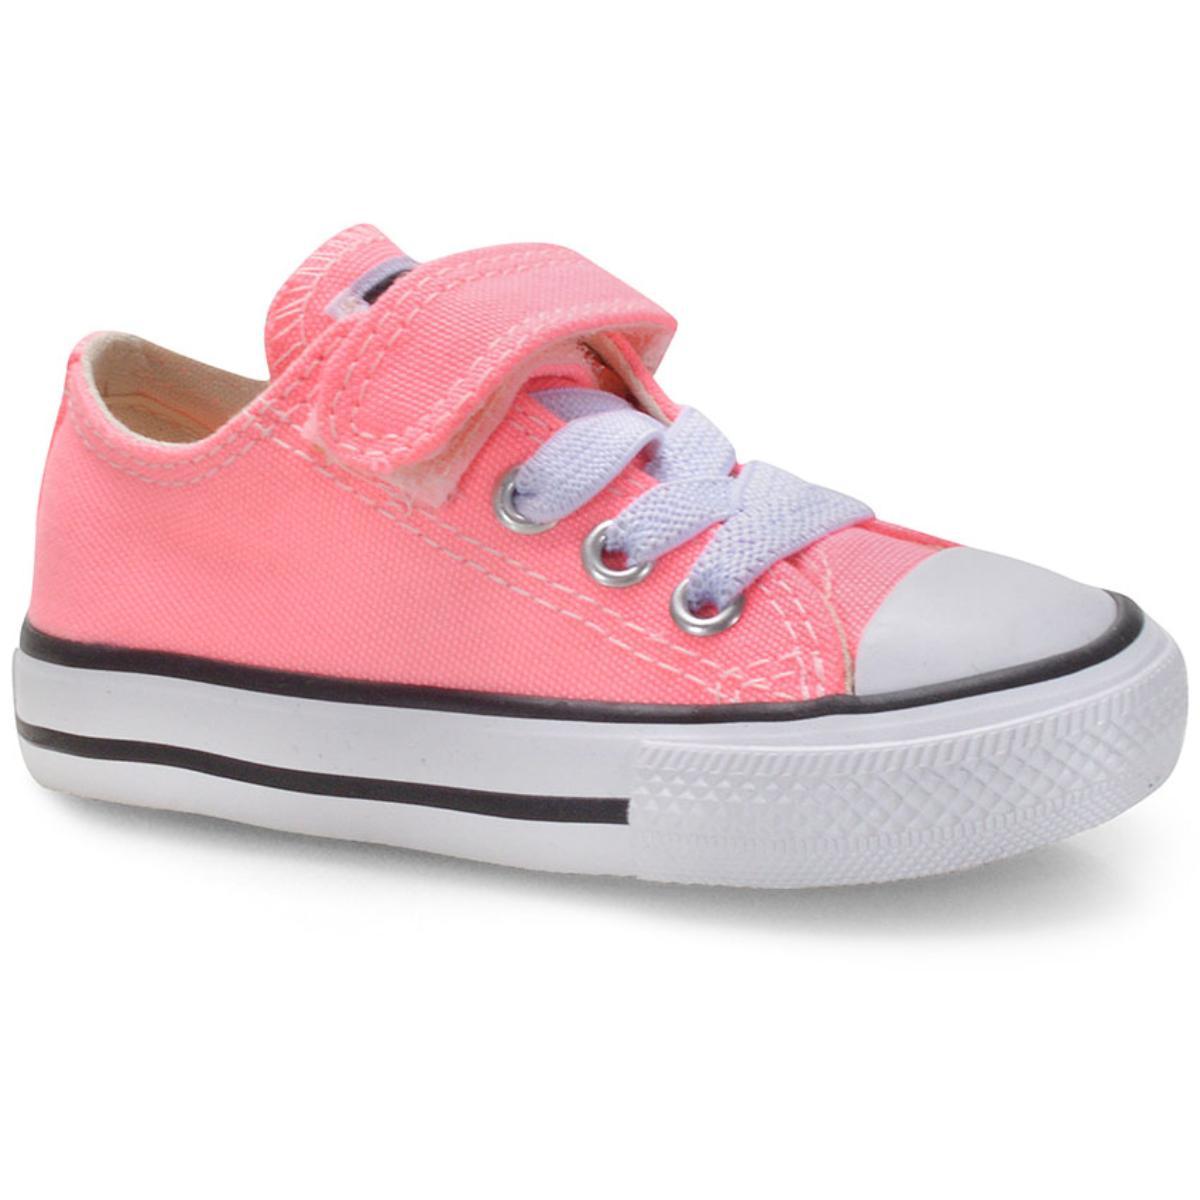 Tênis Fem Infantil All Star Ck08150001 Rosa Fluor/preto/branco